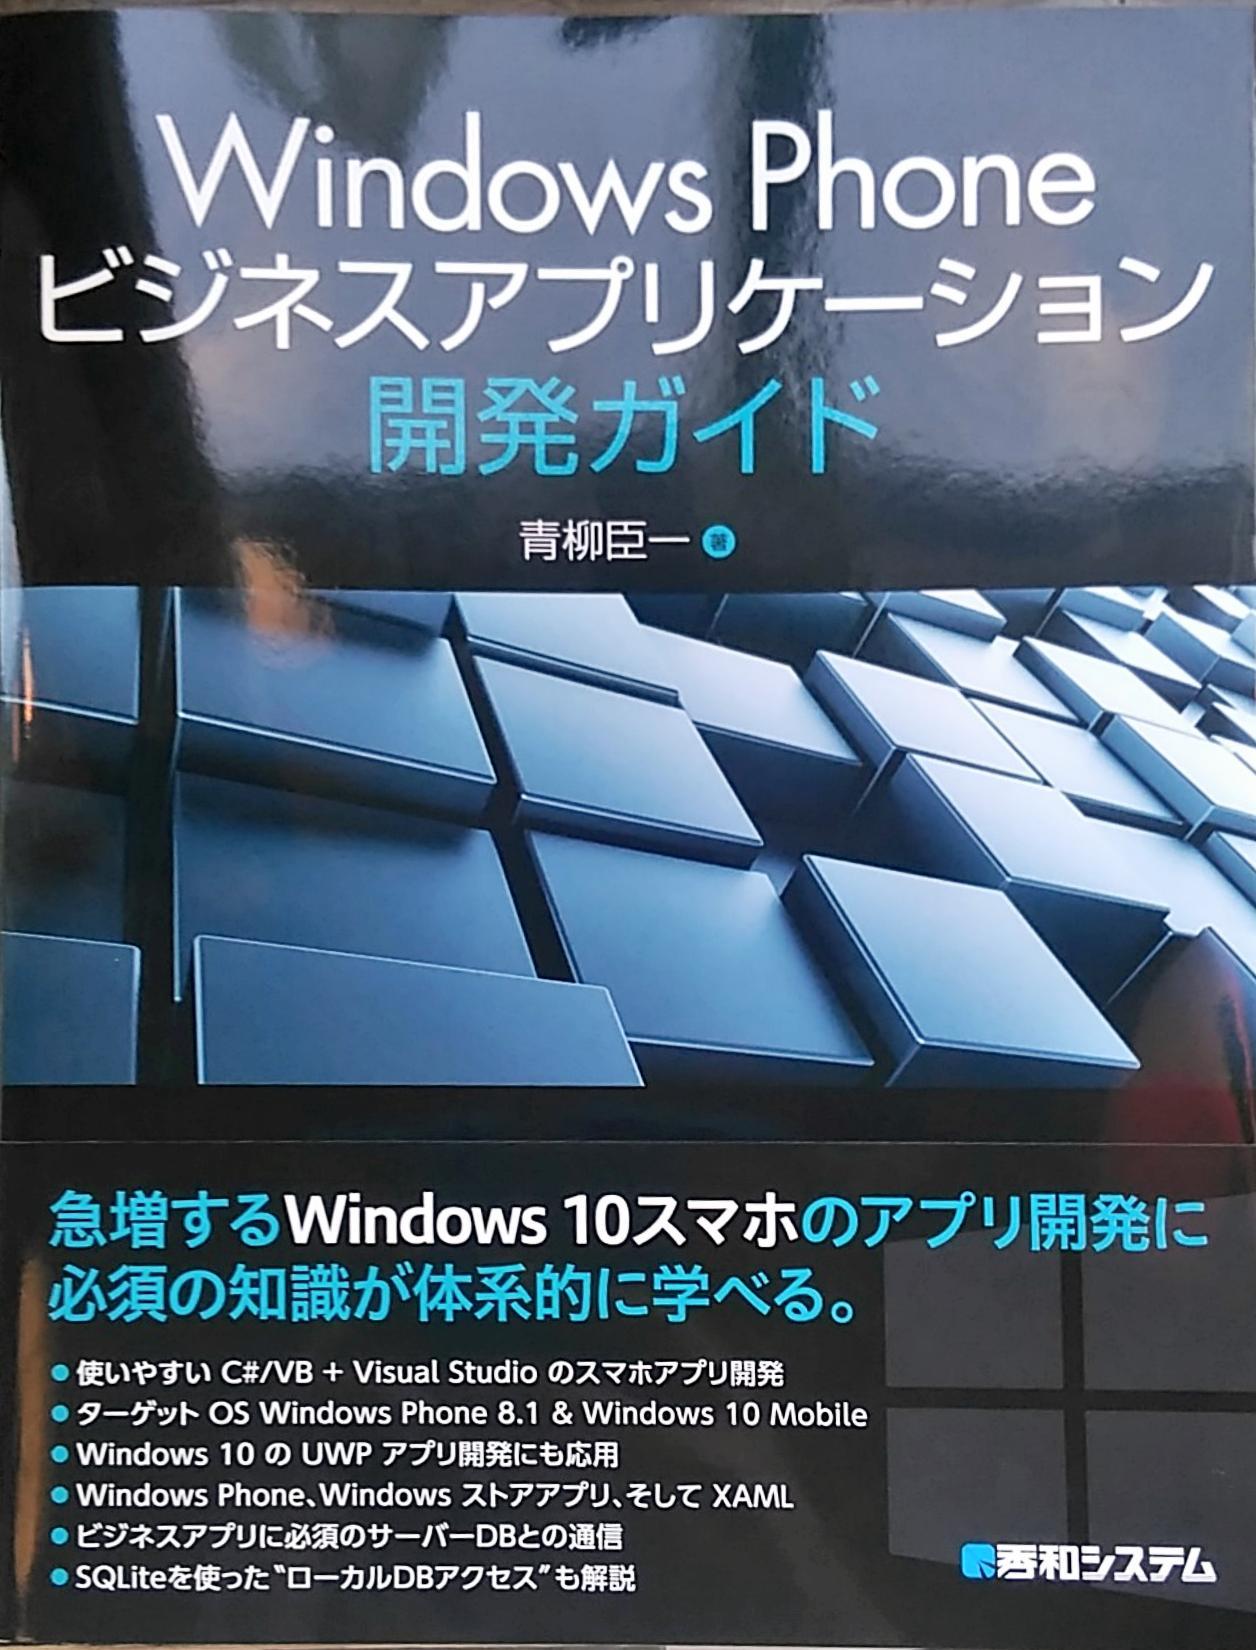 WindowsPhoneビジネスアプリケーション開発ガイド_書籍